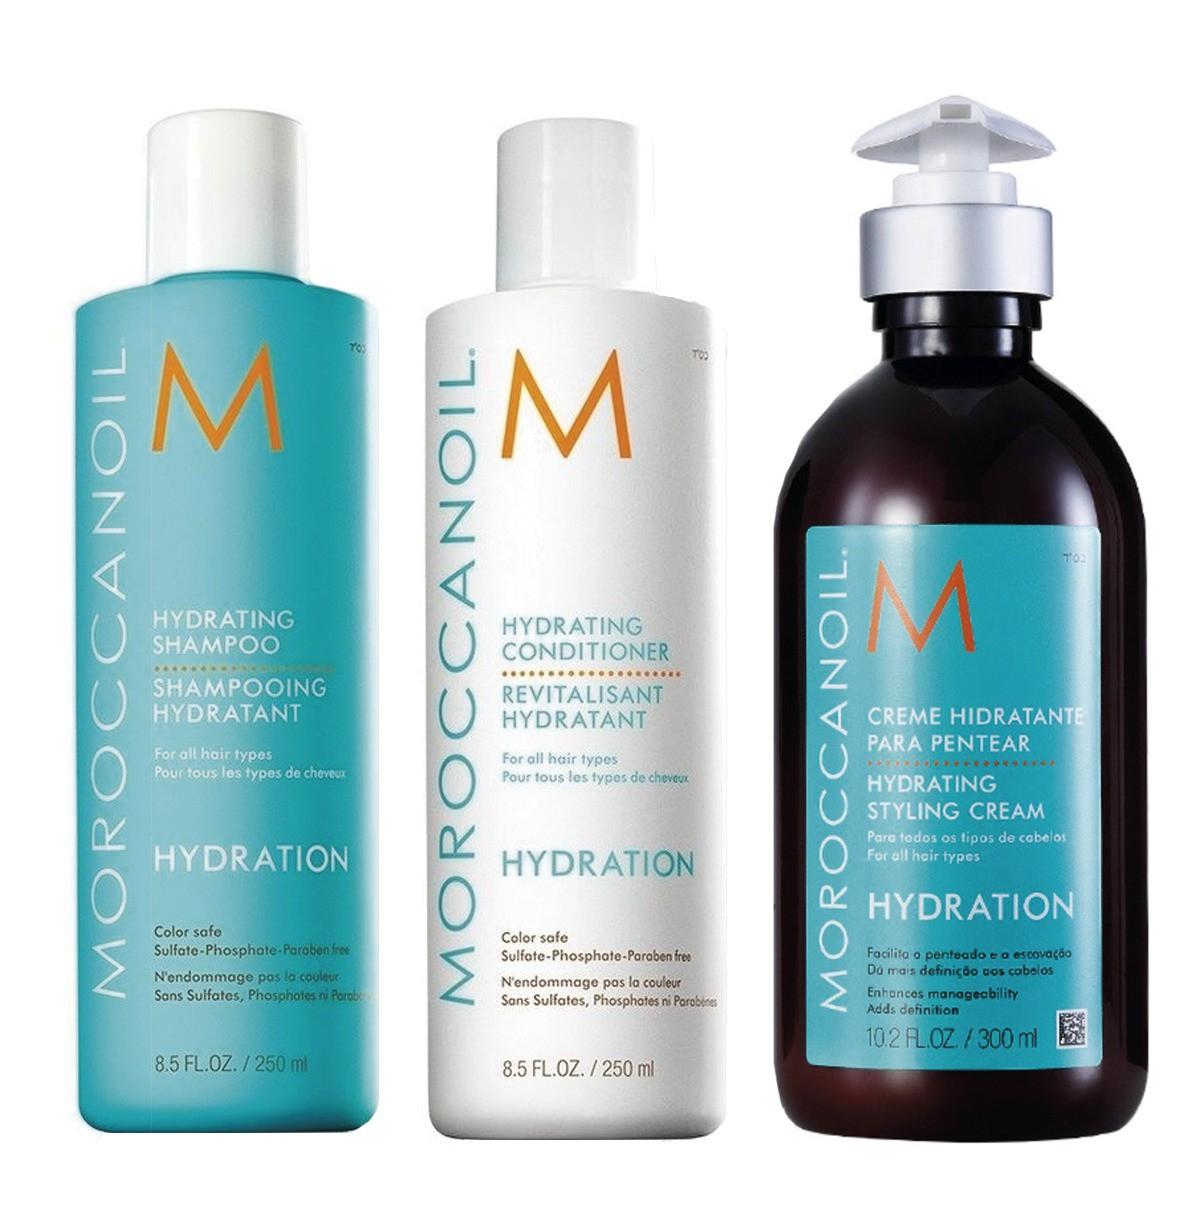 Kit Moroccanoil Hidratante Shampoo 250ml  + Condicionador 250ml + Creme de Pentear 300ml